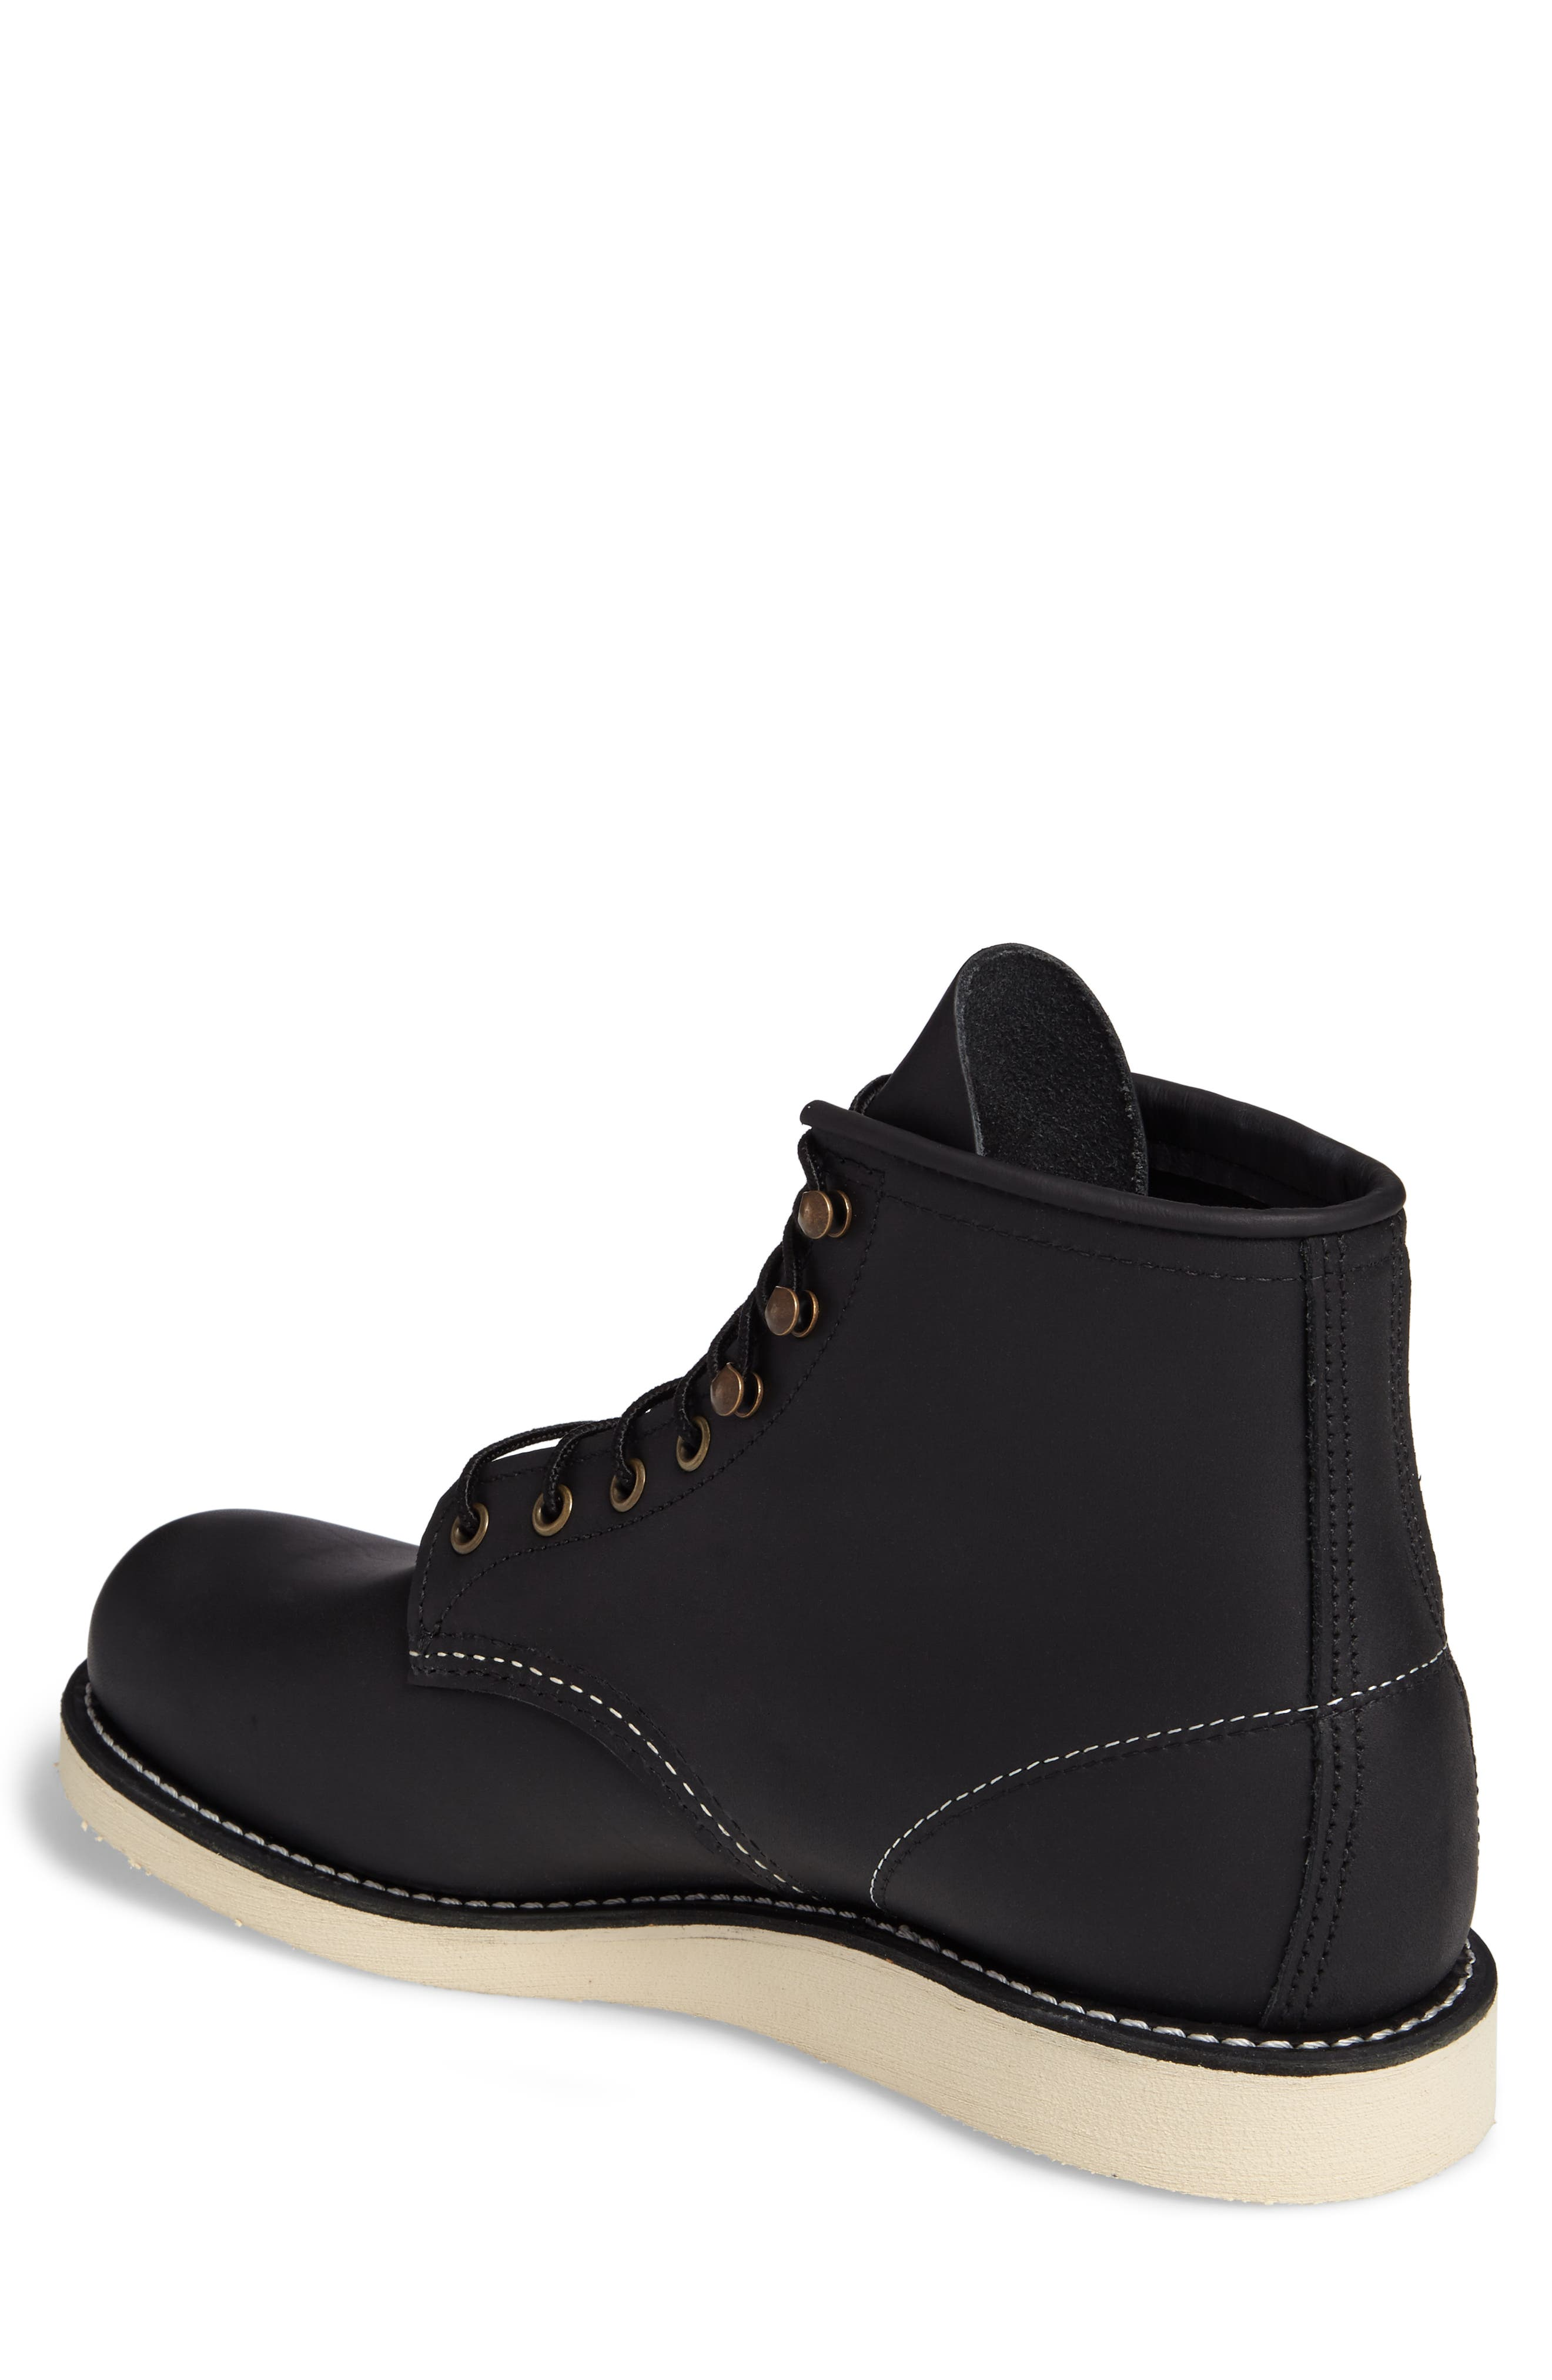 Rover Plain Toe Boot,                             Alternate thumbnail 2, color,                             Black Harness Leather